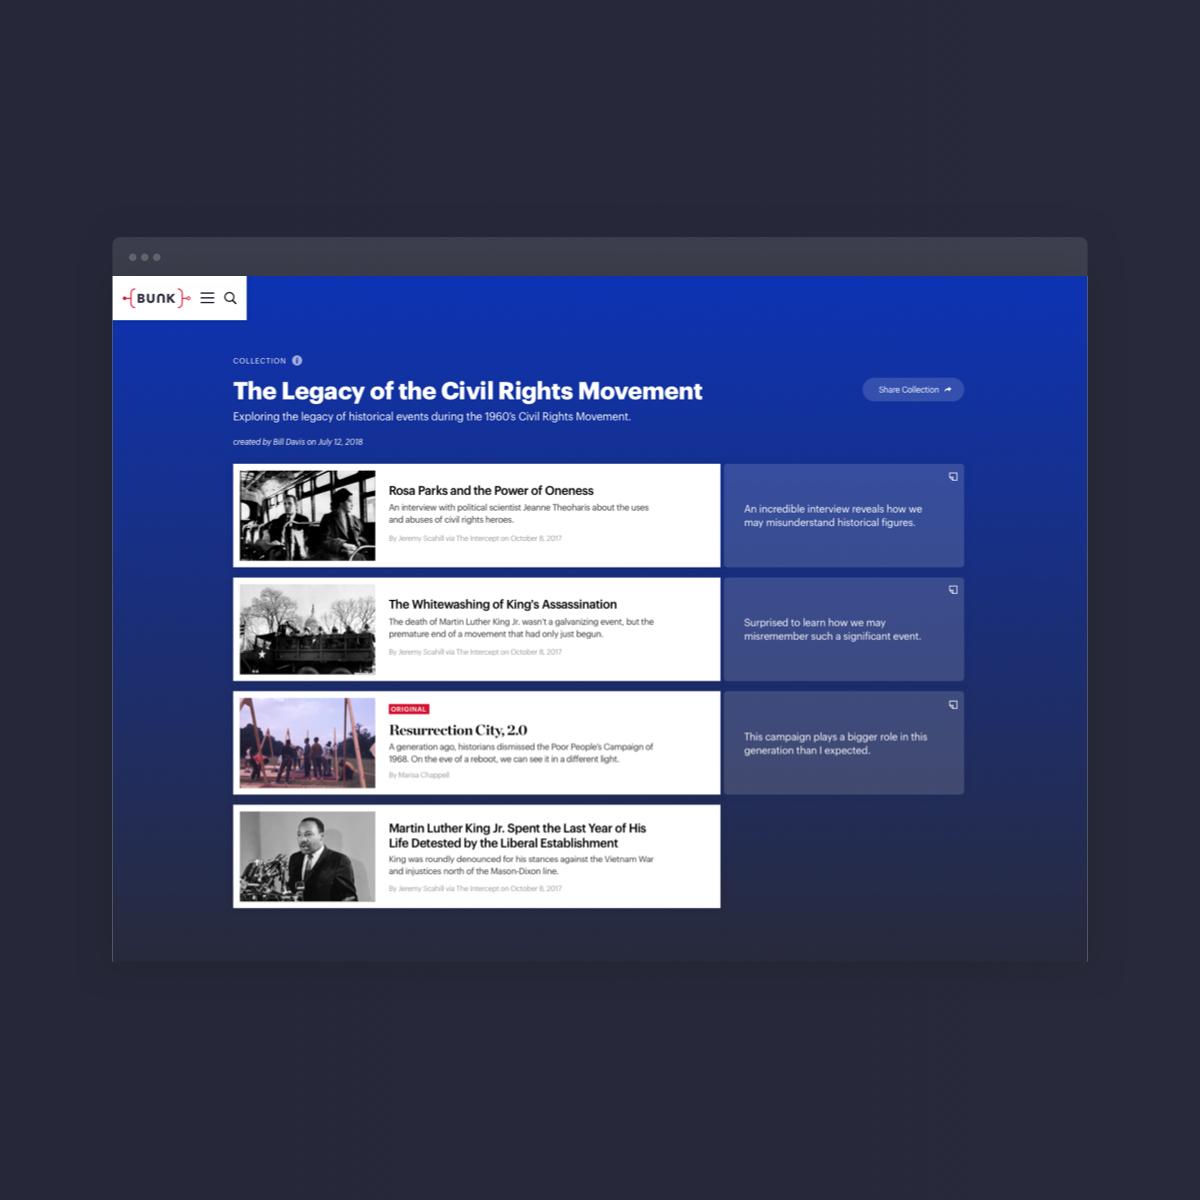 Bunk History Web